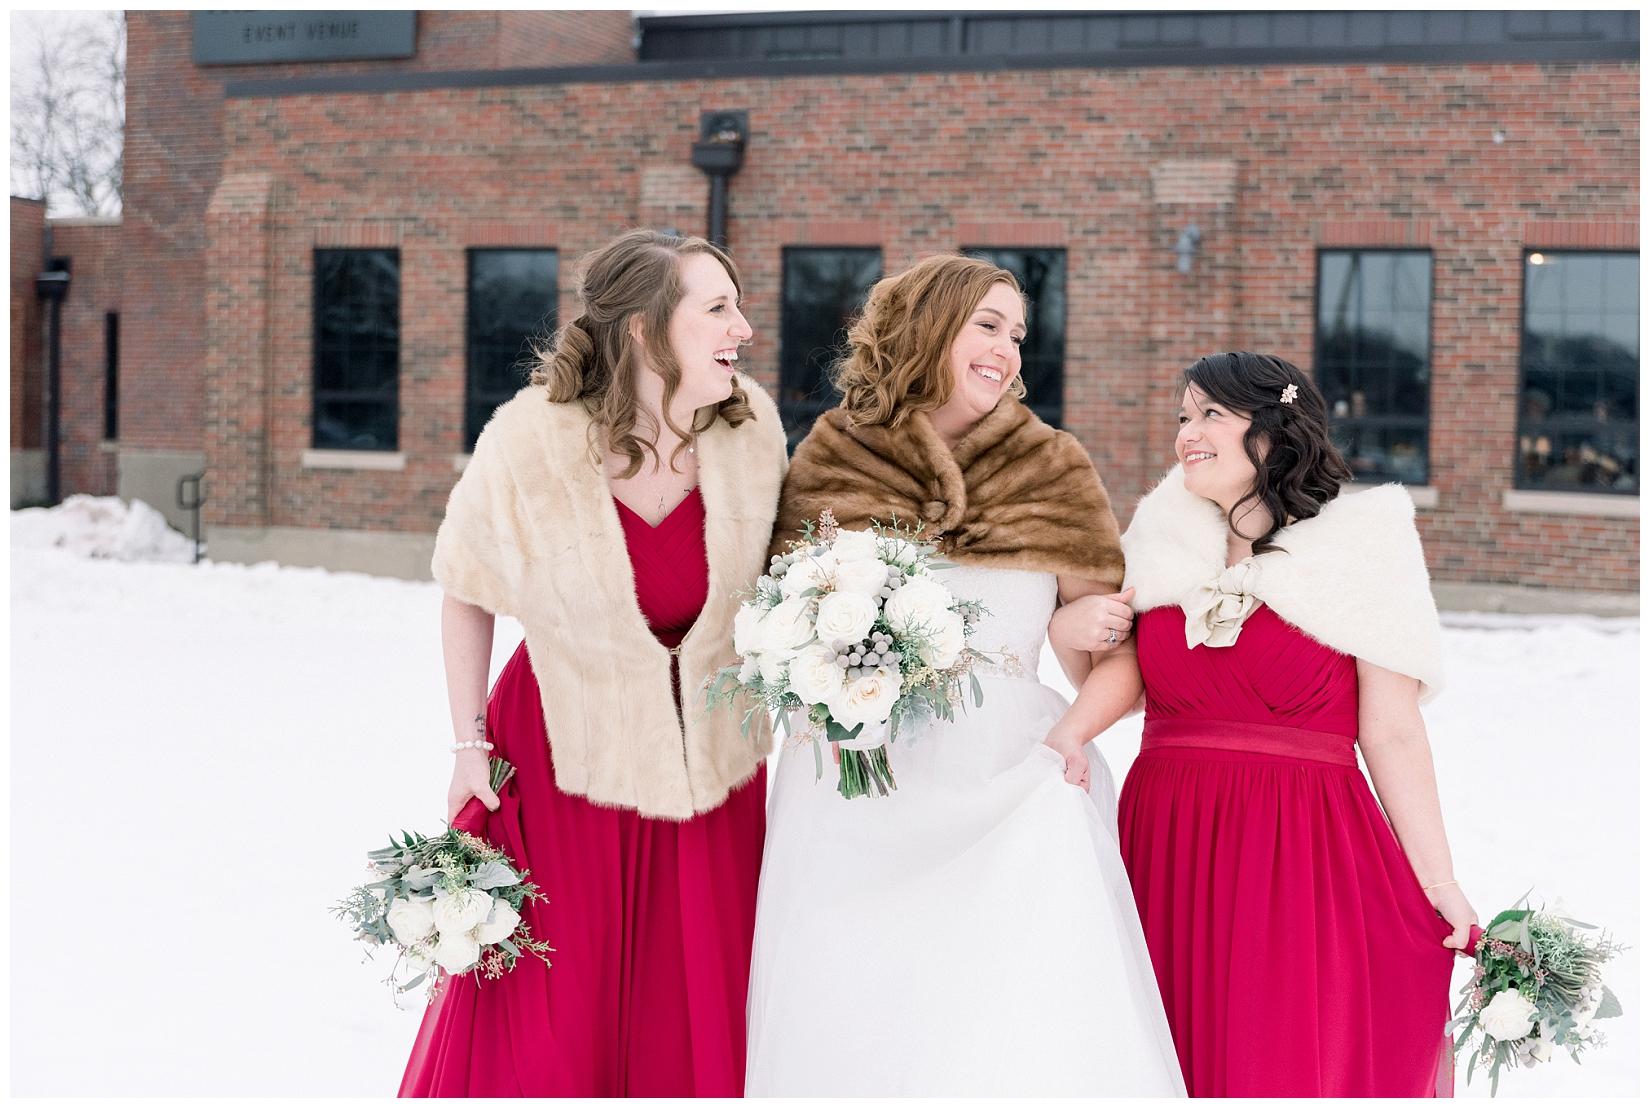 cat-alkire-wedding-photographer-indiana-chicago-indianapolis-fort-wayne_0960.jpg